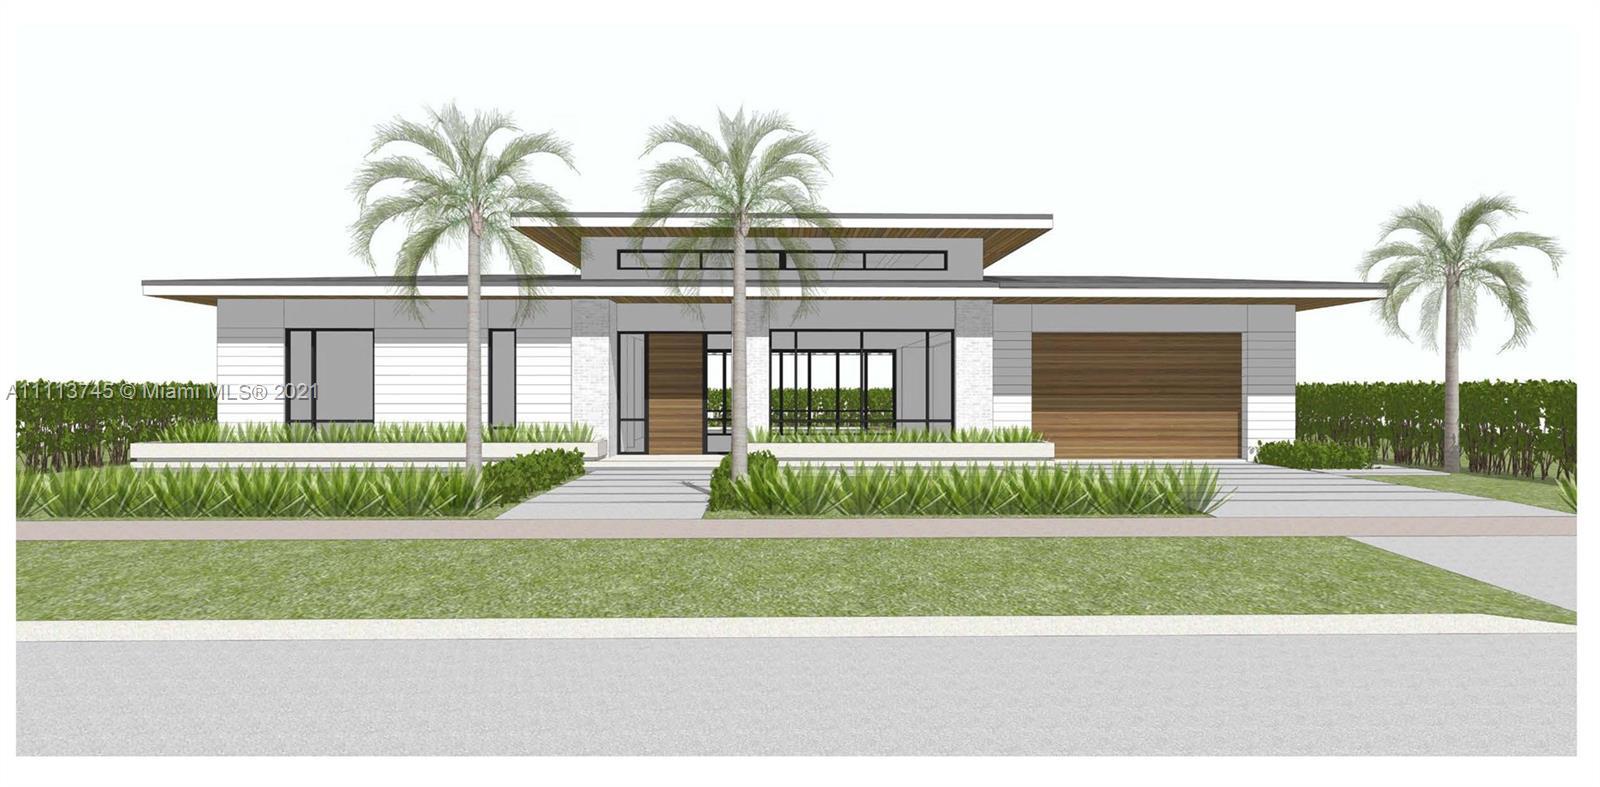 Single Family Home,For Sale,1111 Alberca St, Coral Gables, Florida 33134,Brickell,realty,broker,condos near me